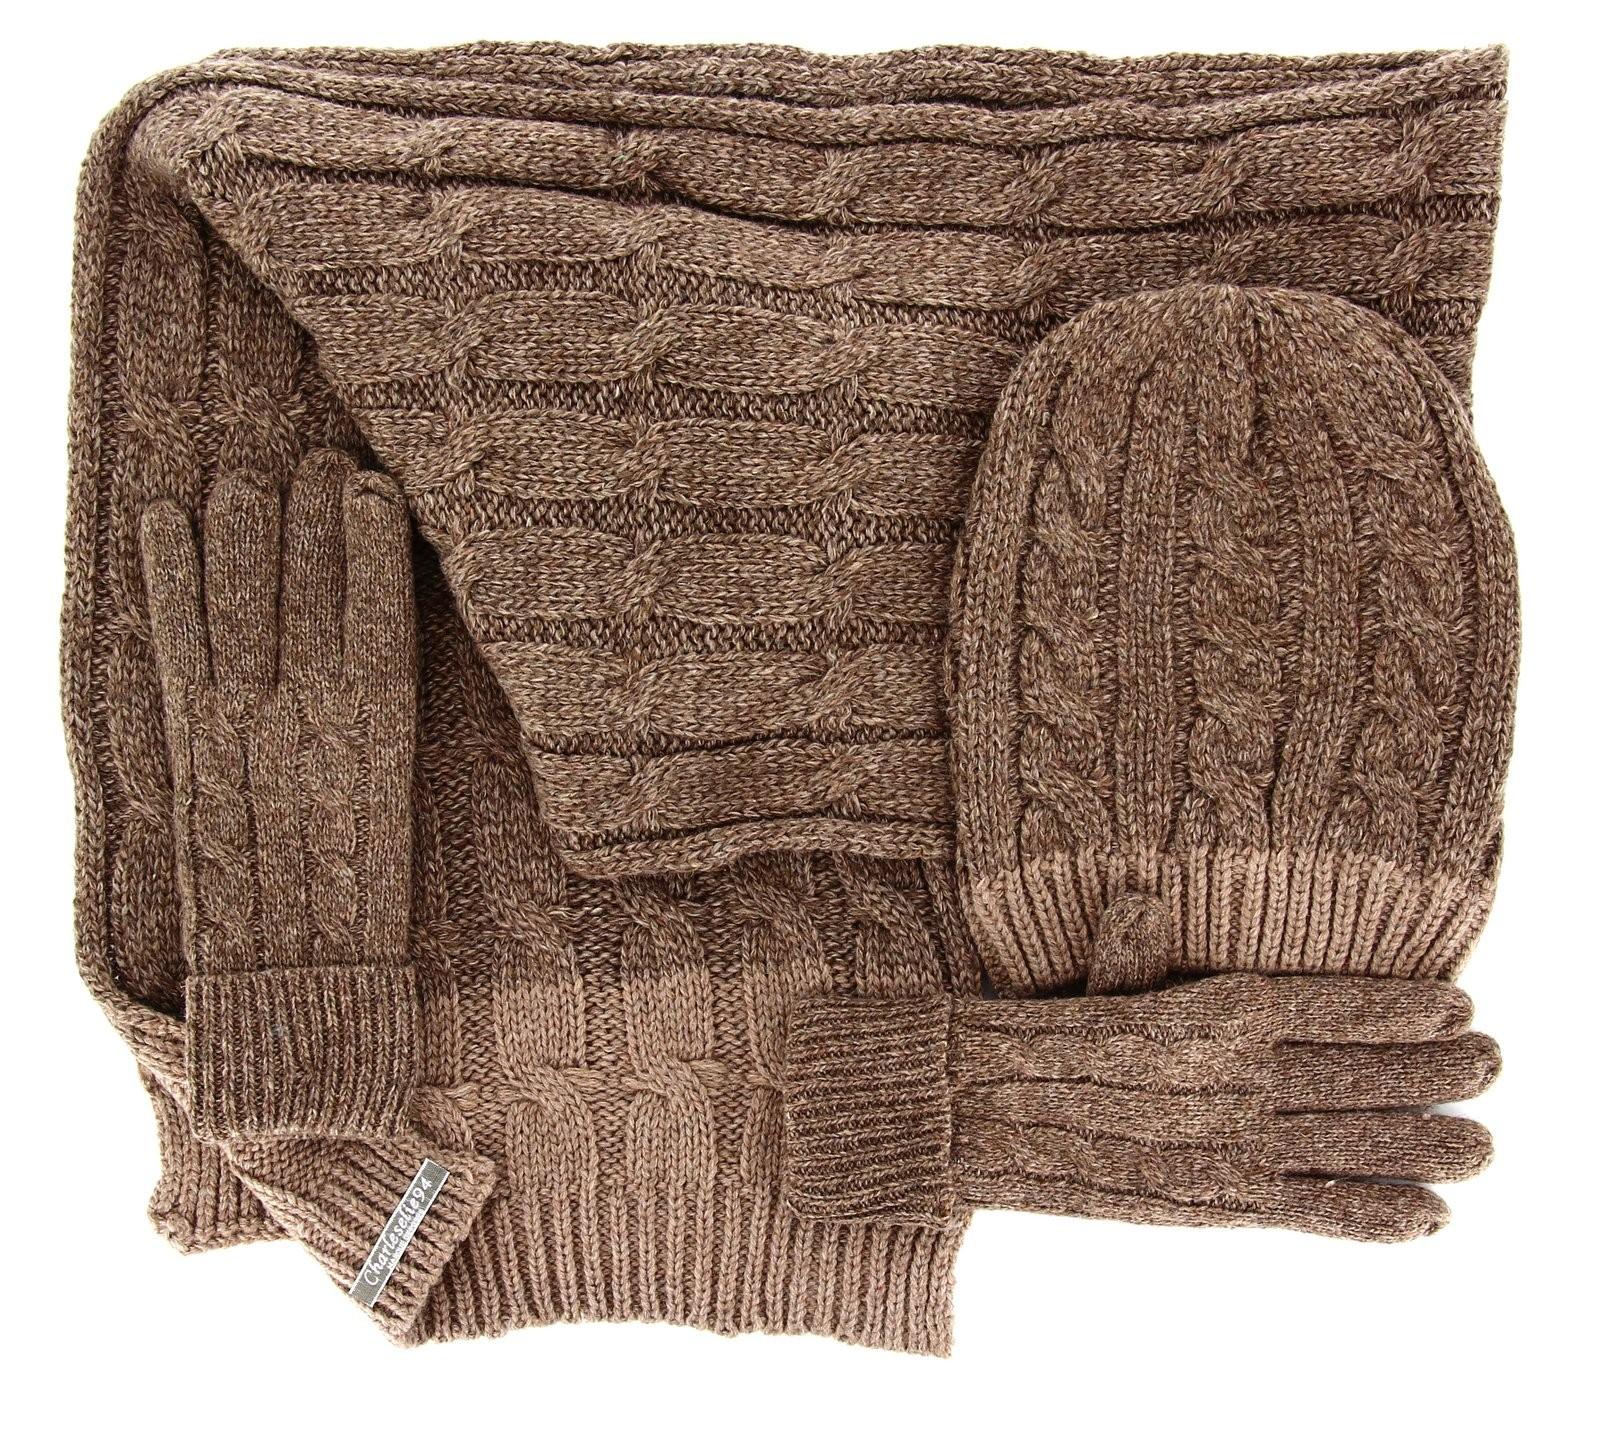 pack charpe longue bonnet gants laine homme femme hiver taupe damien. Black Bedroom Furniture Sets. Home Design Ideas